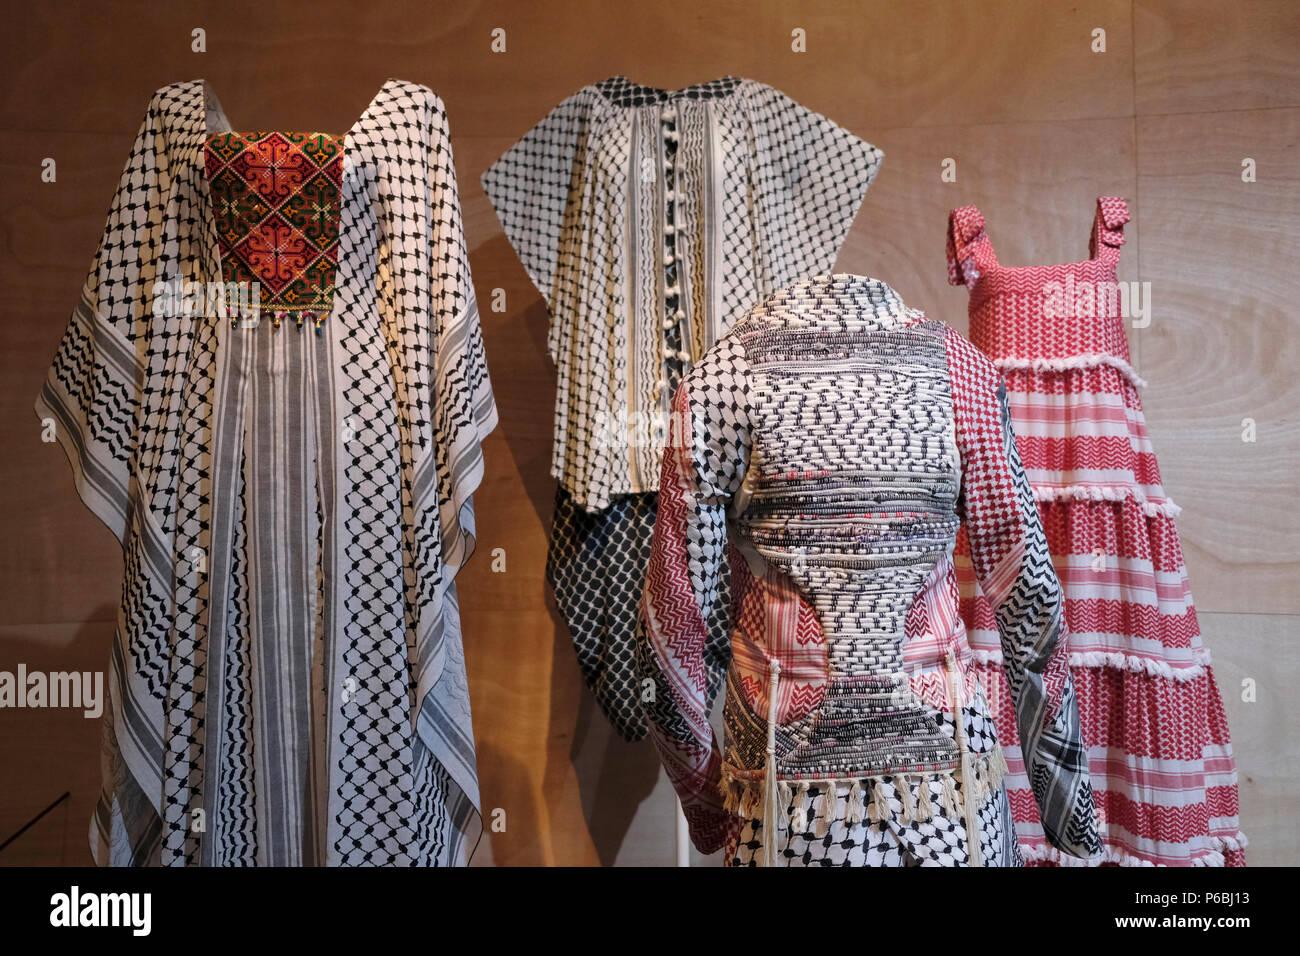 Clothing By Israeli Fashion Designers Displayed At The New Exhibition Entitled Fashion Statements Decoding Israeli Dress